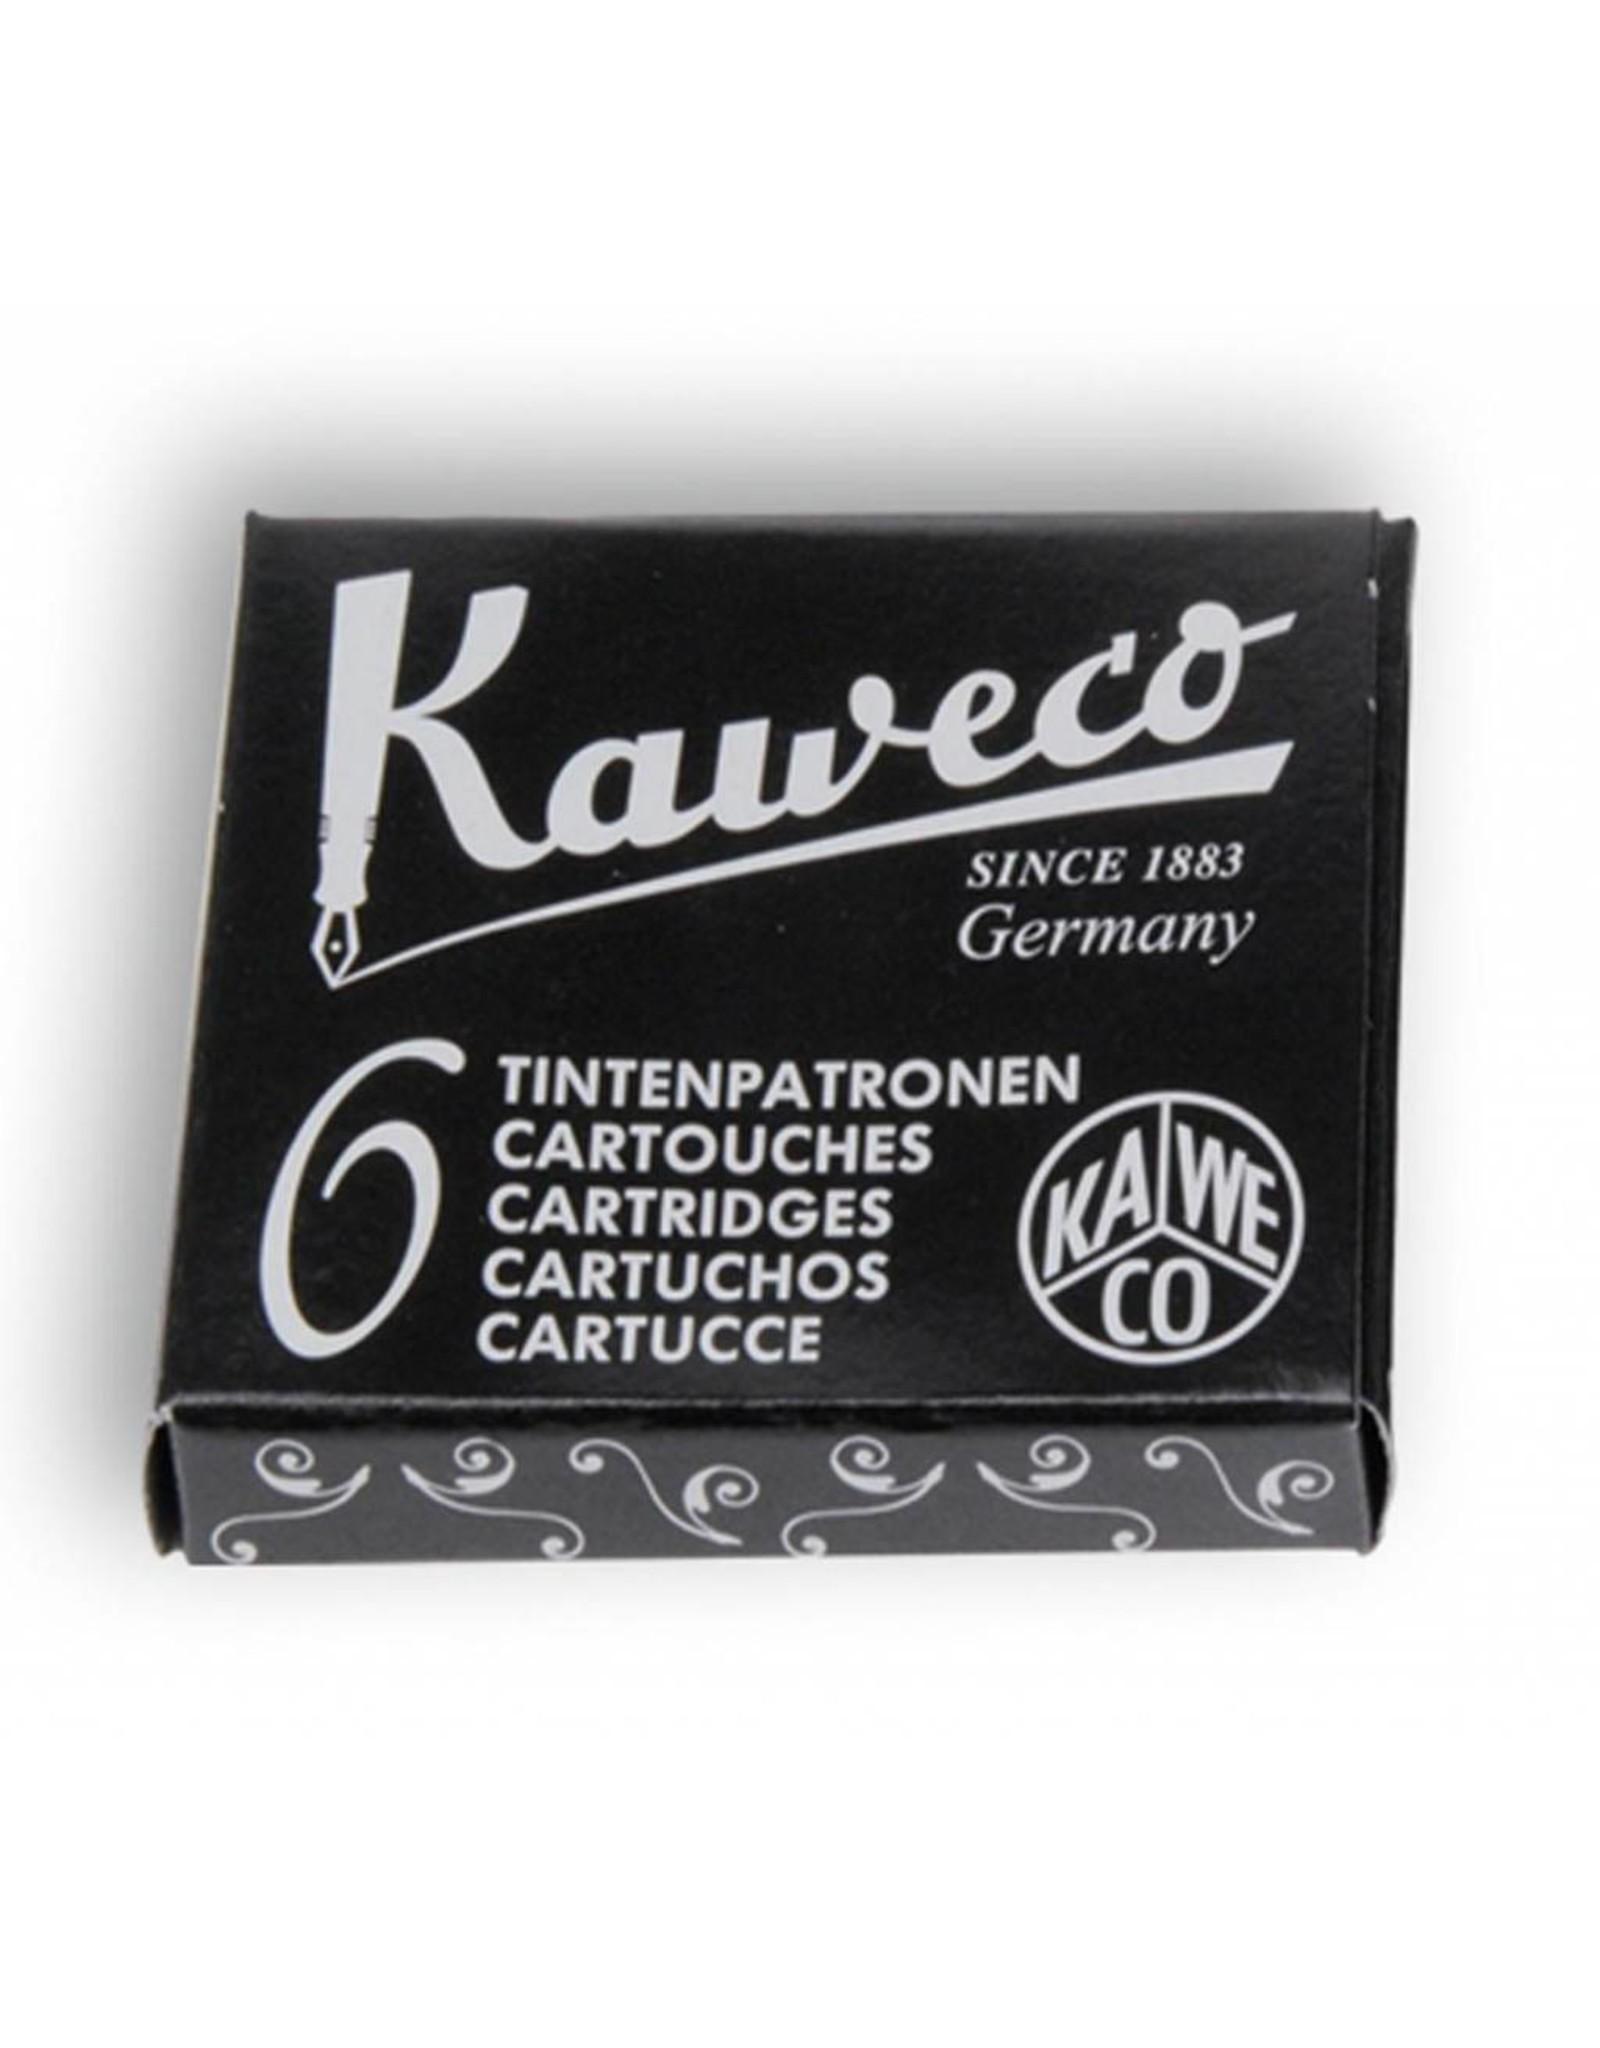 Kaweco vulpen vullingen (6) pearl black